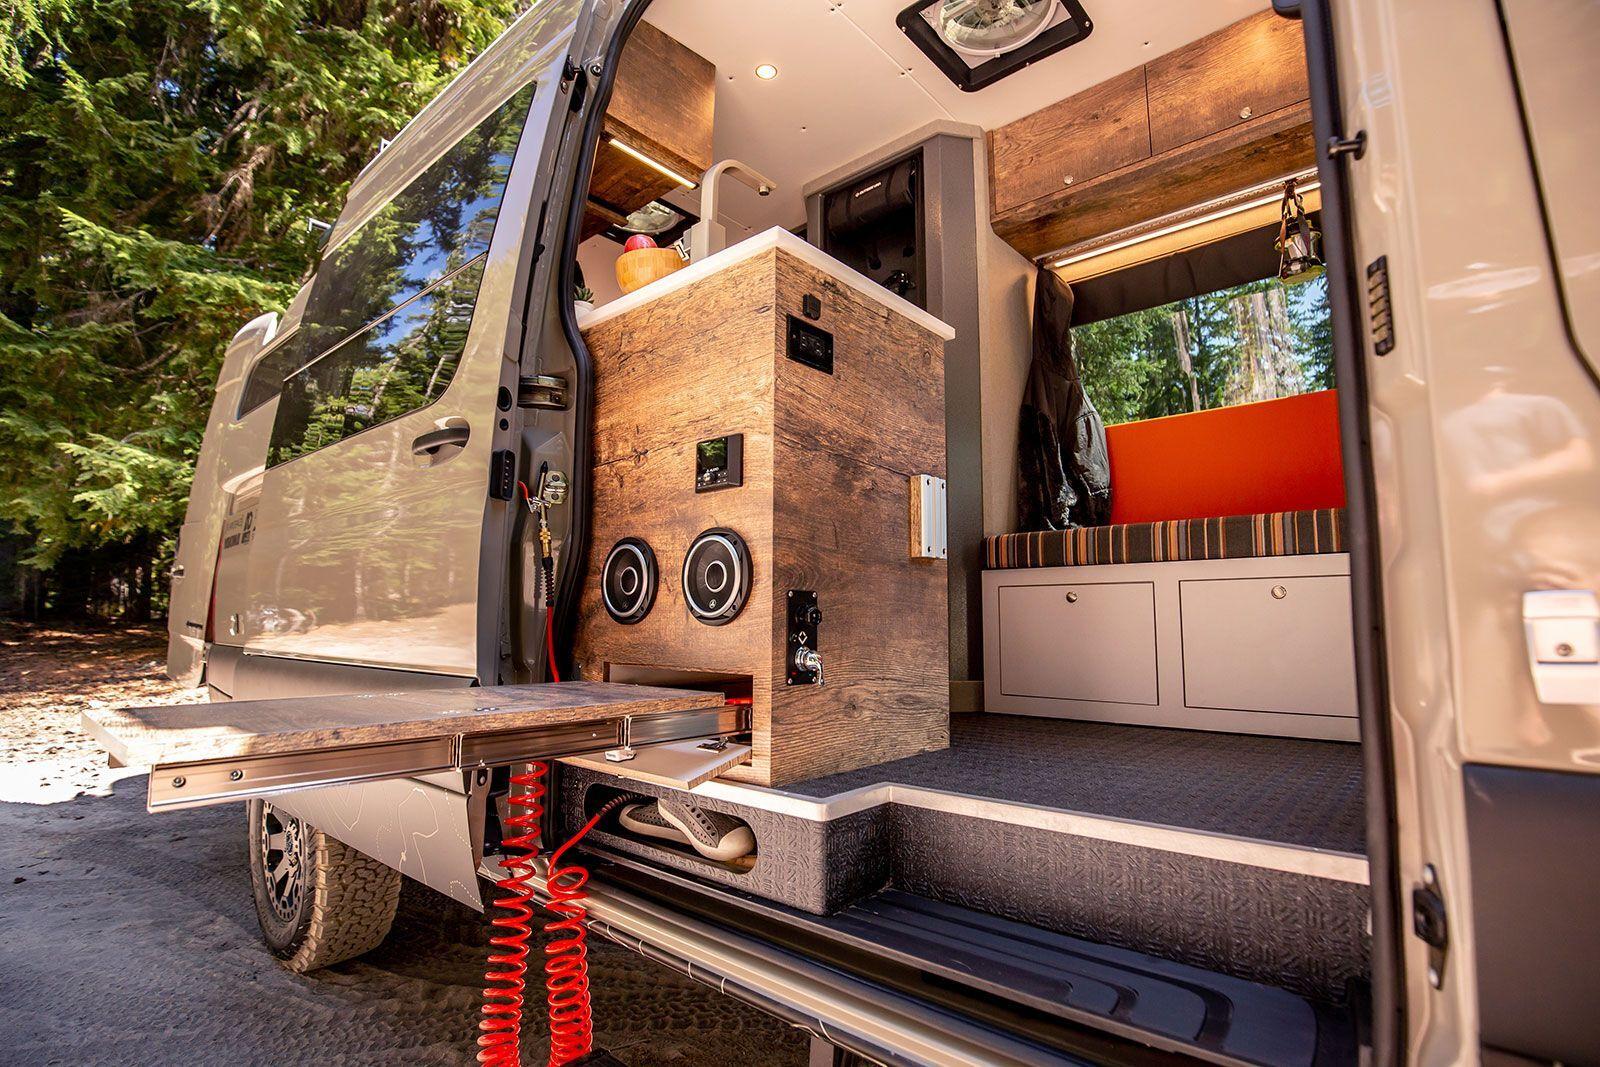 Elevate предназначен для комфортного путешествия компании из 6 человек